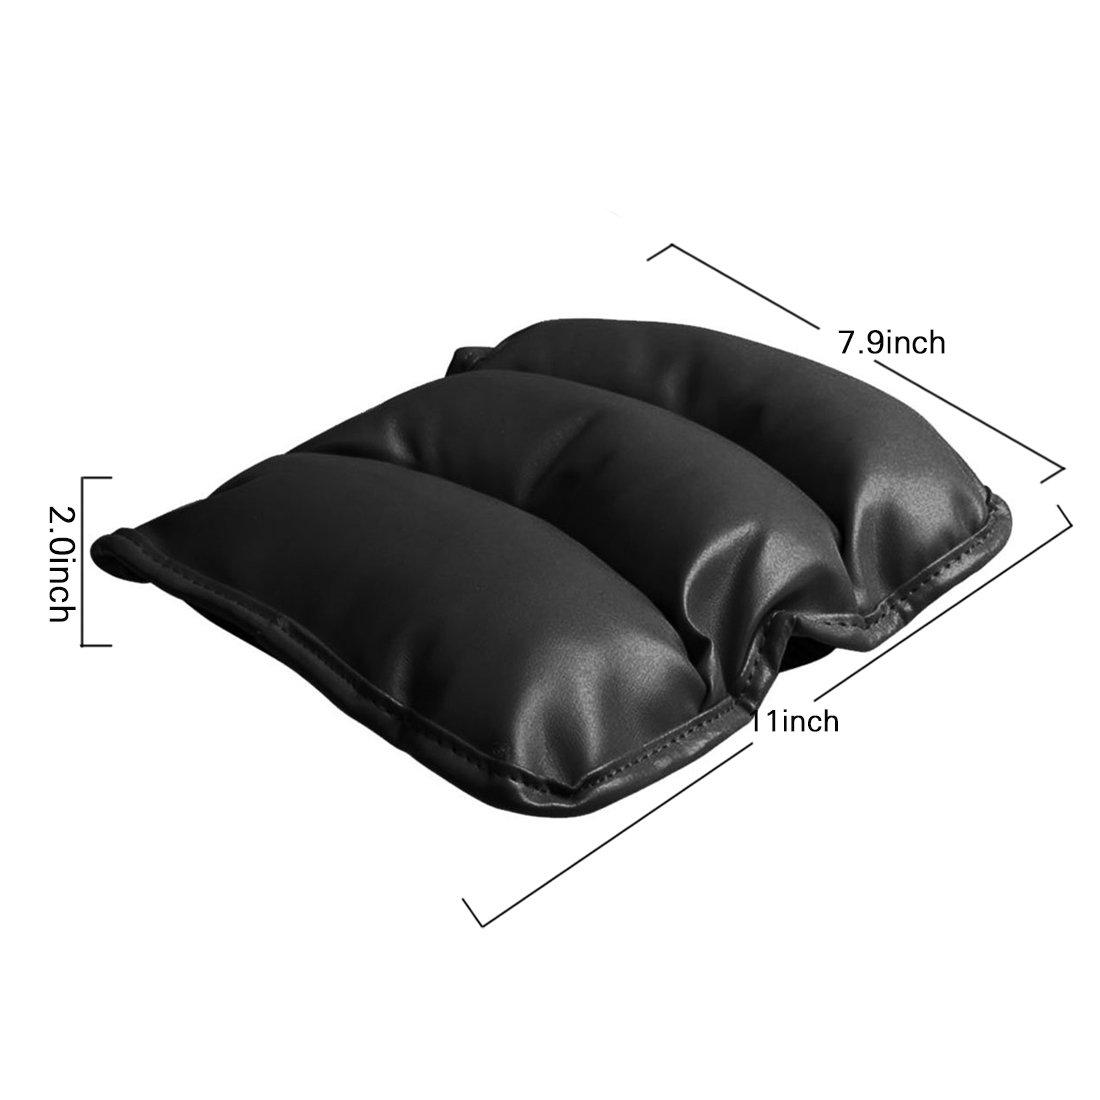 1x Universal PU Leather Car Armrest Box Mat Console Pad Cushion Cover Black